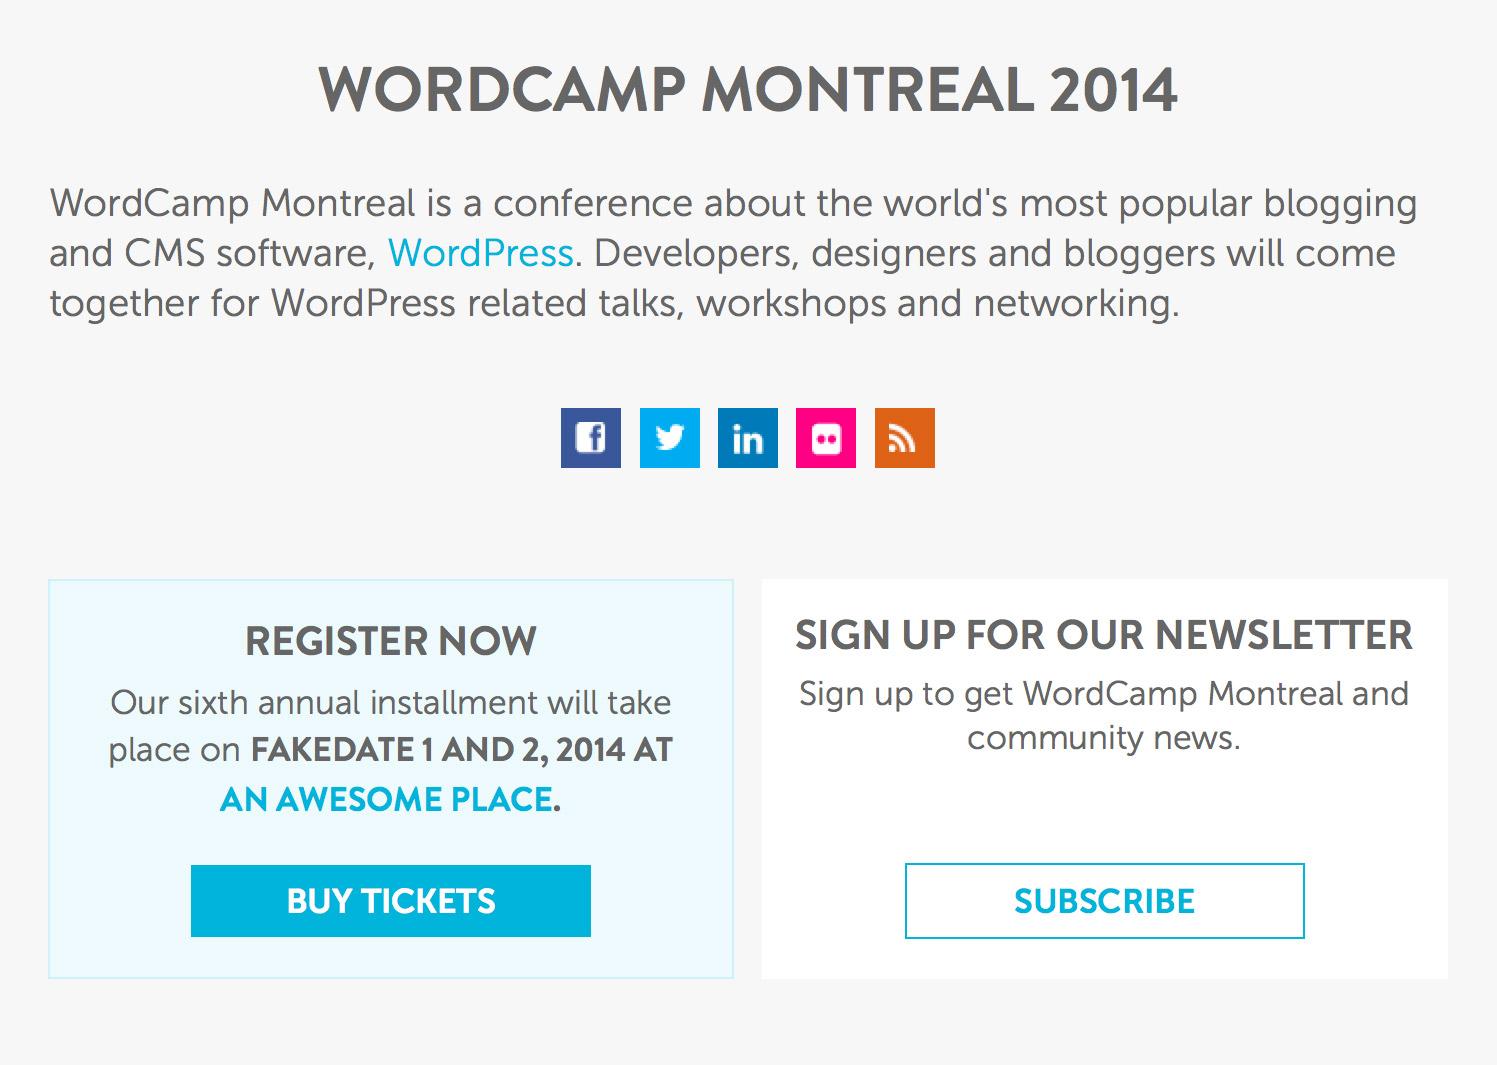 WordCamp Montreal 2014 homepage design screenshot